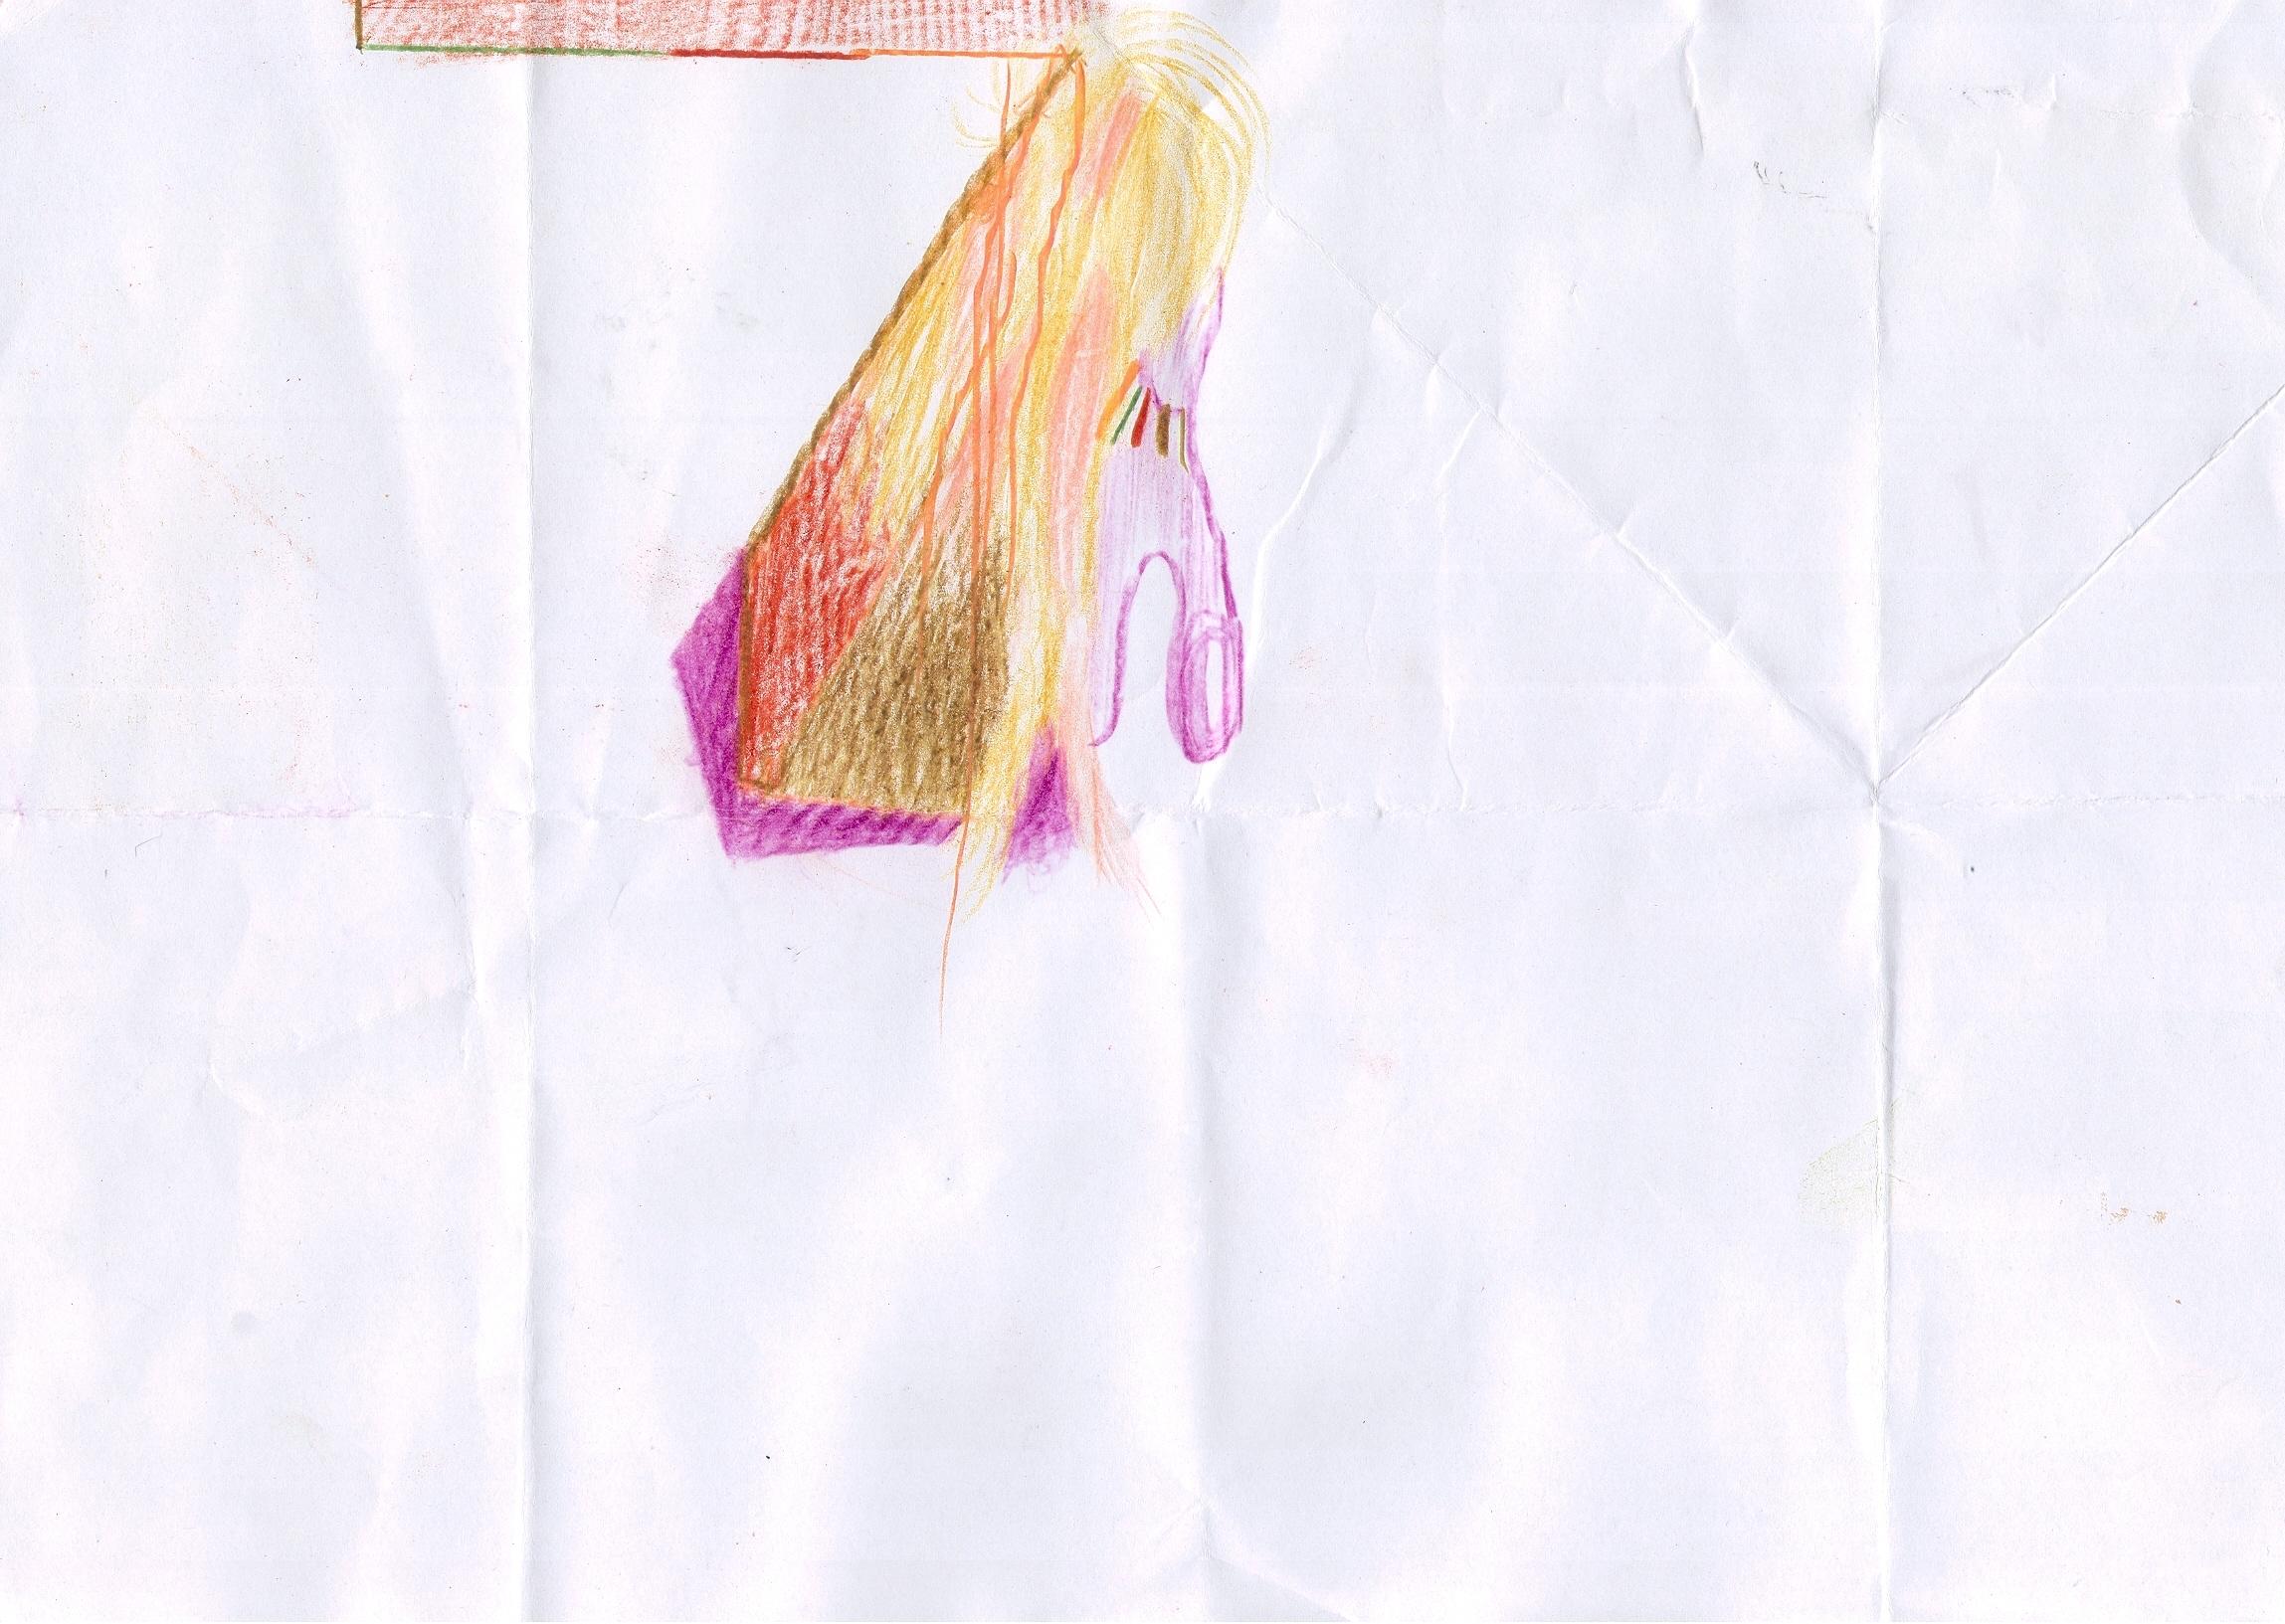 O.T., 2018  Buntstift Papier, 29.8x21cm